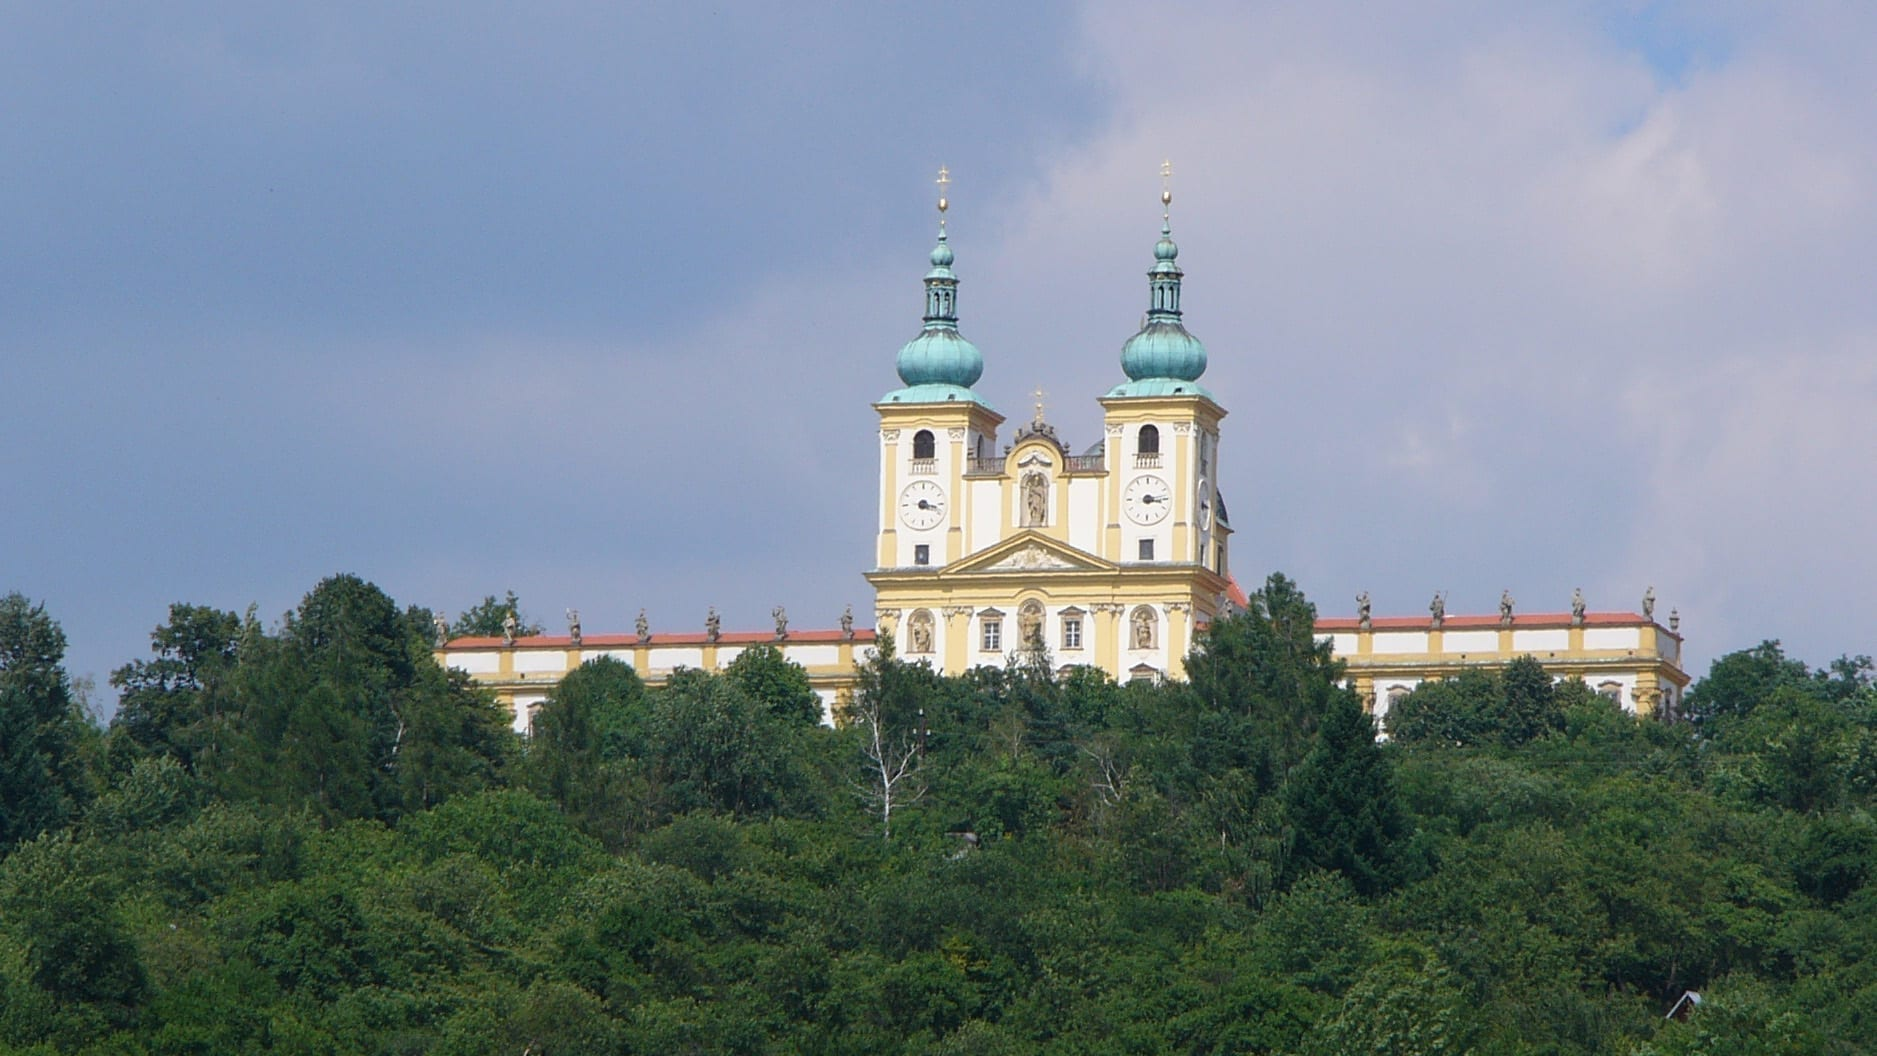 La Iglesia en Svaty Kopecek Olomouc República Checa